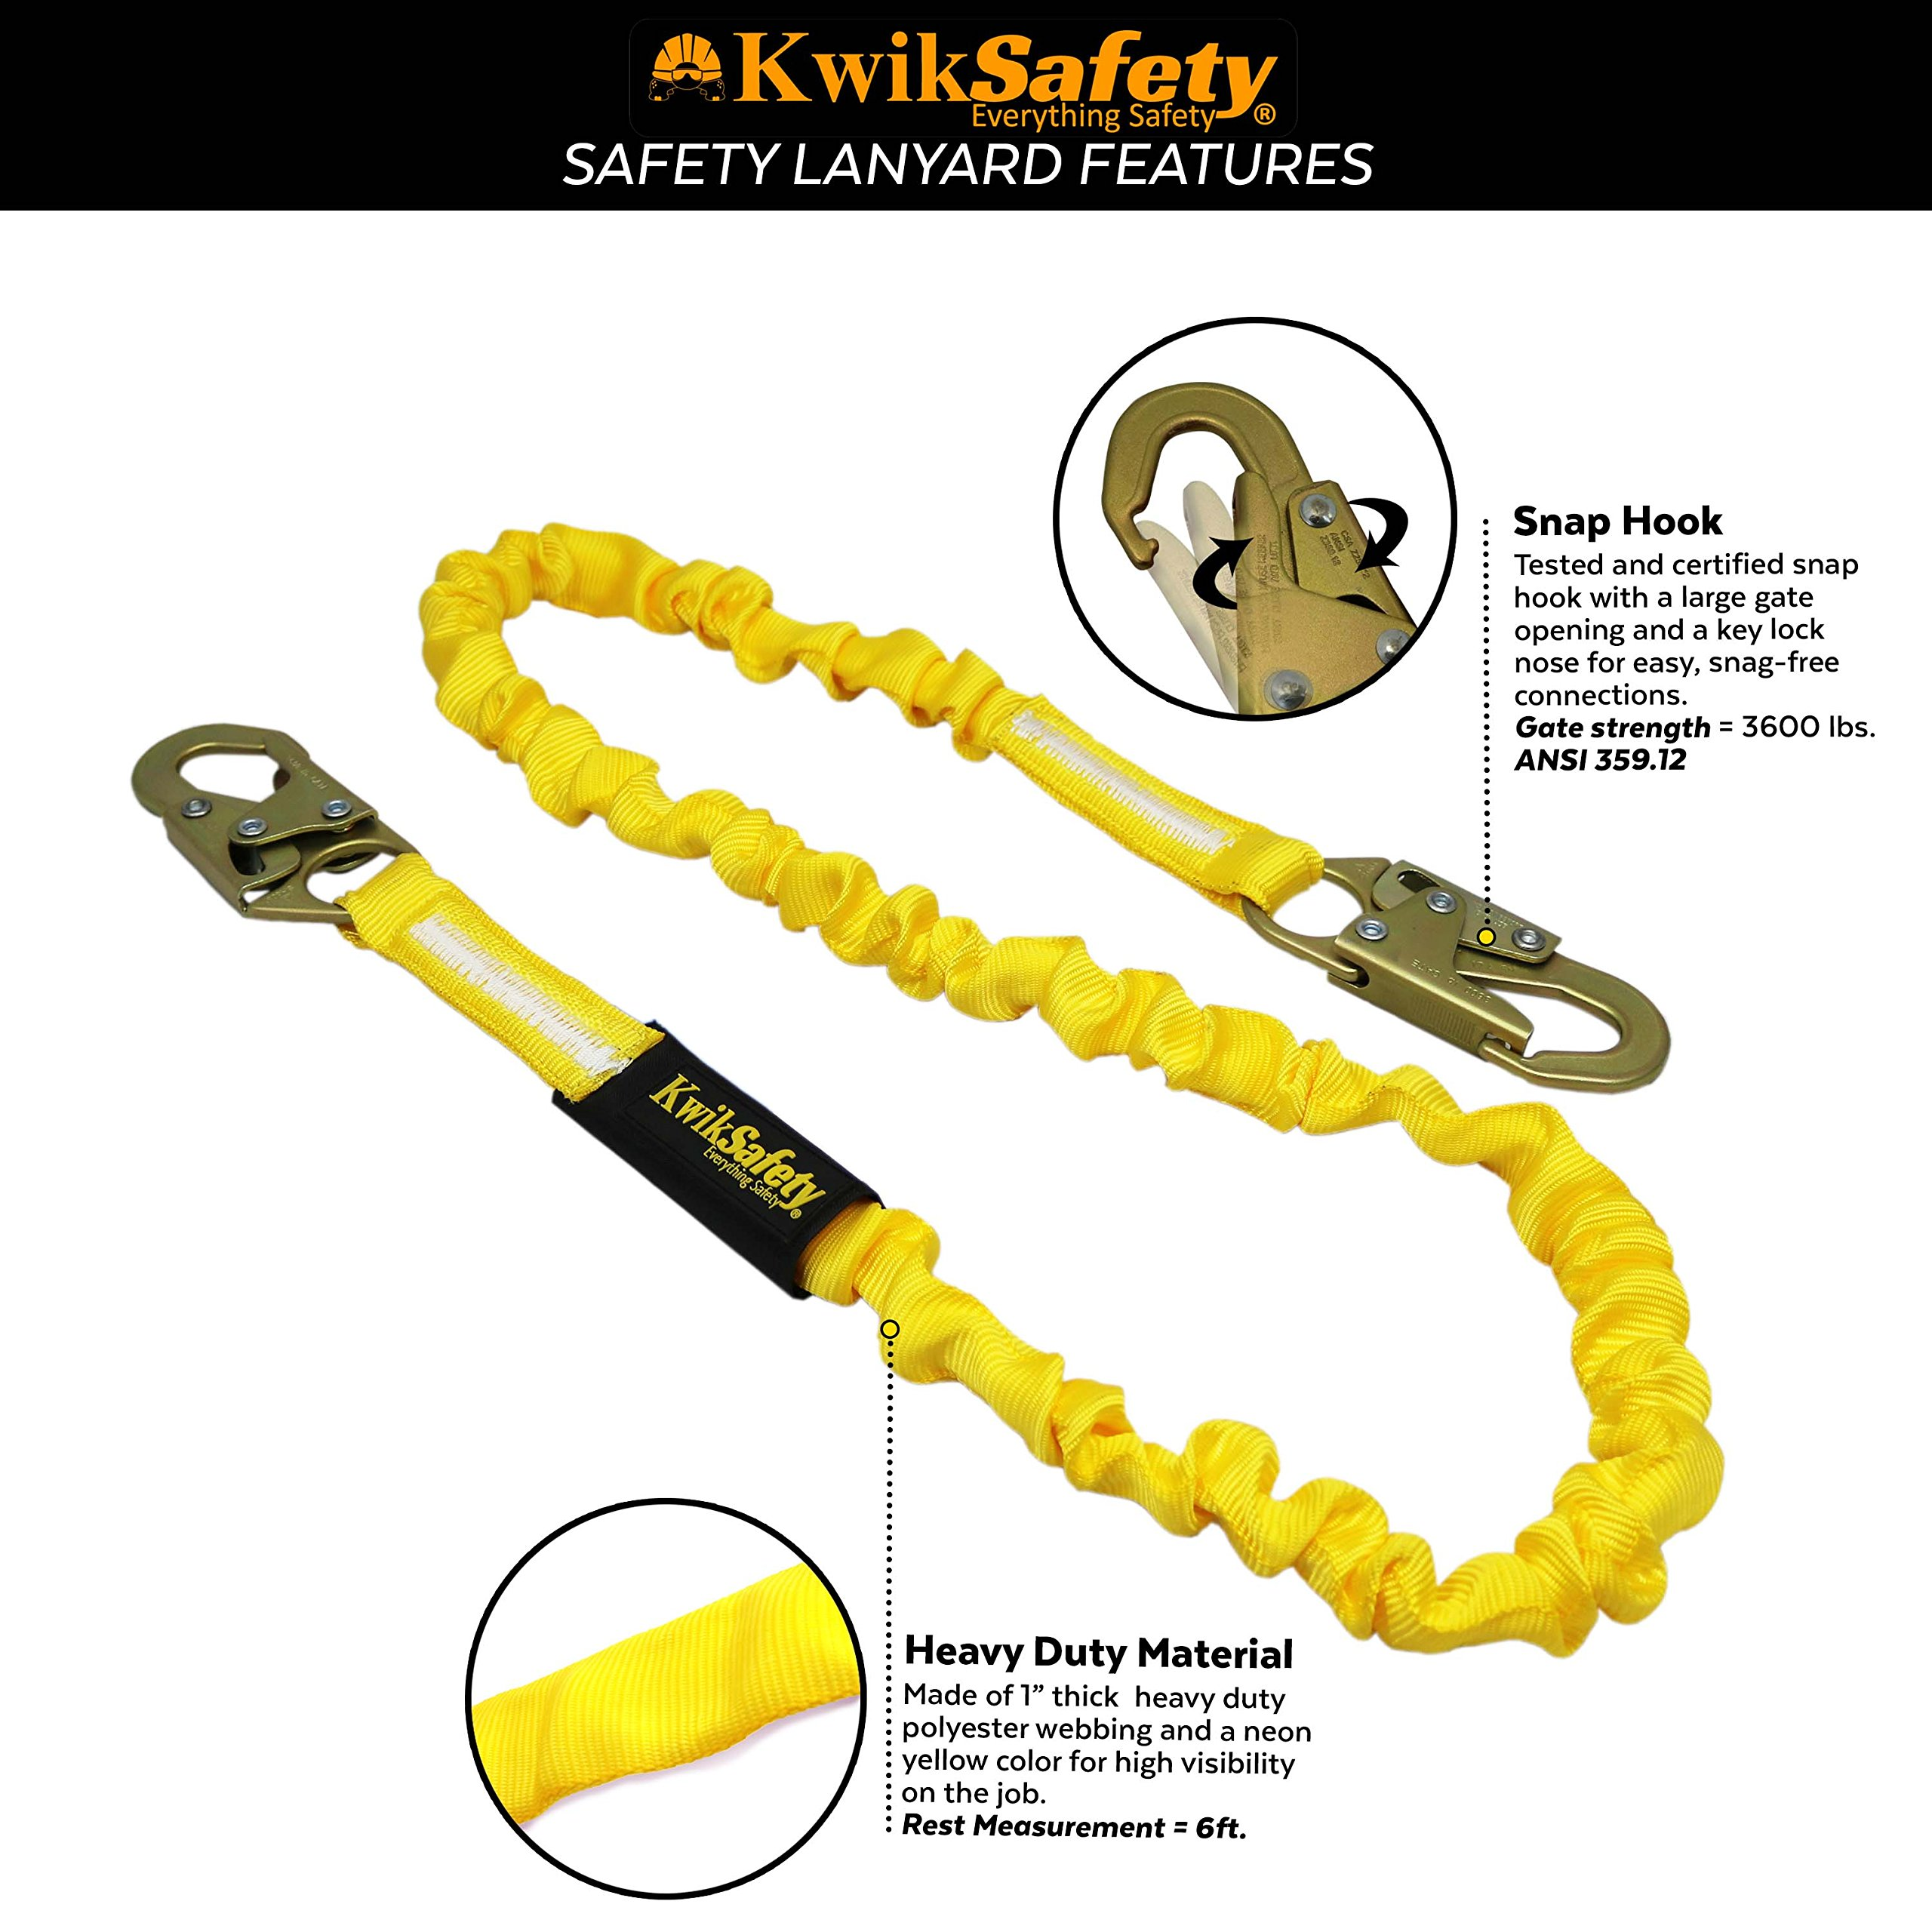 KwikSafety (Charlotte, NC) RATTLER 2 PACK (Internal Shock Absorber) Single Leg 6ft Safety Lanyard, Tool Lanyard OSHA ANSI Fall Protection Equipment Snap Hooks Construction Arborist Roofing by KwikSafety (Image #4)